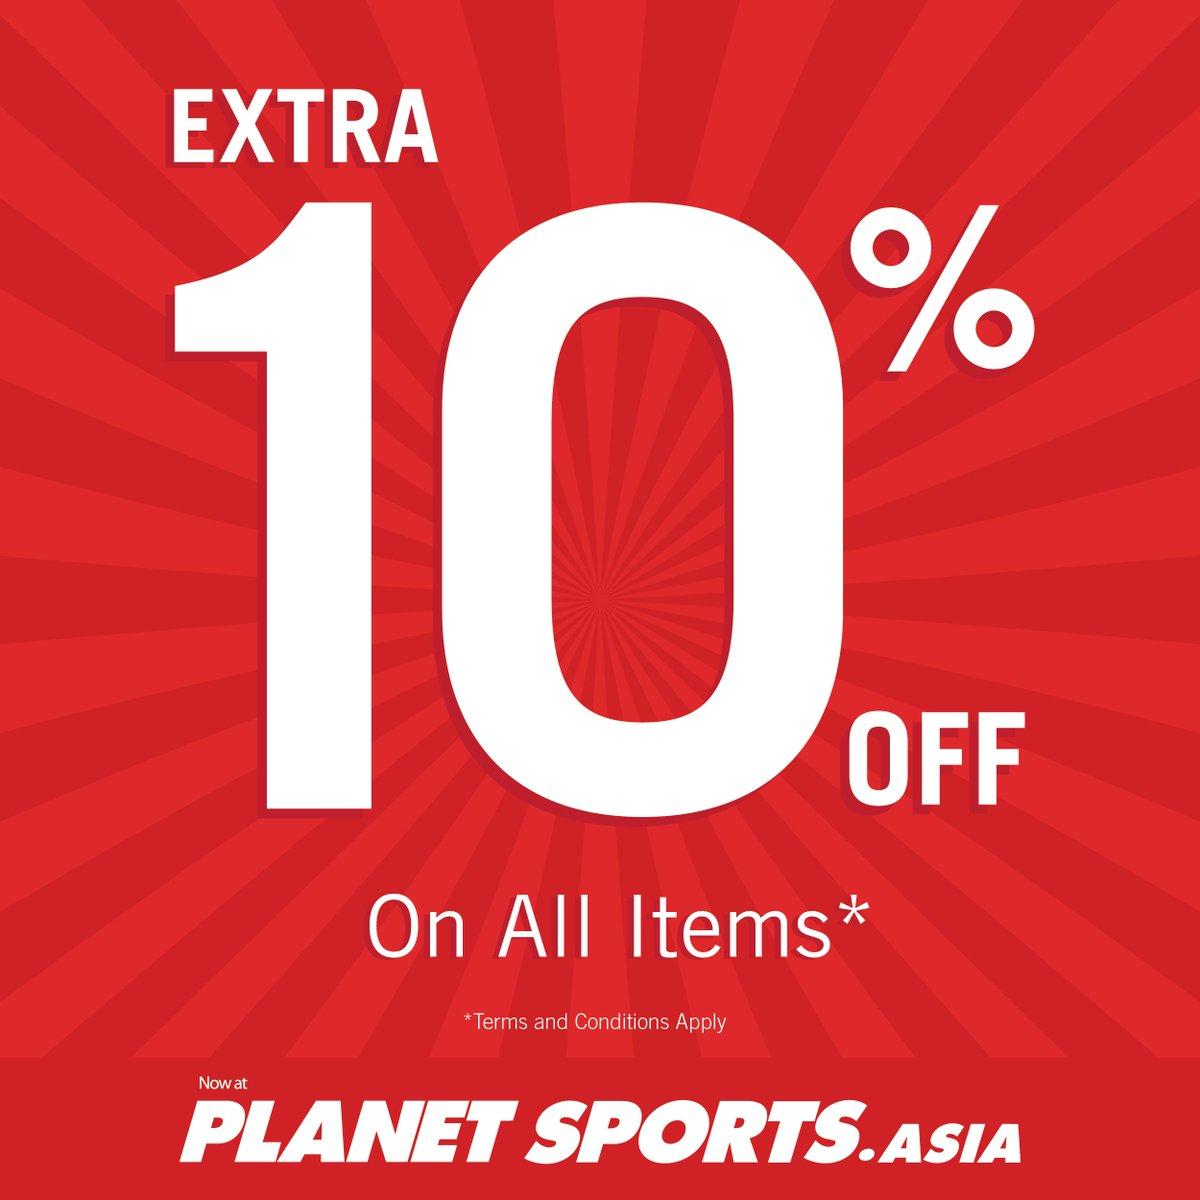 Senayan City On Twitter Get X Tra 10 Off Discount T C Apply Visit Planet Sports Senayan City 3rd Floor